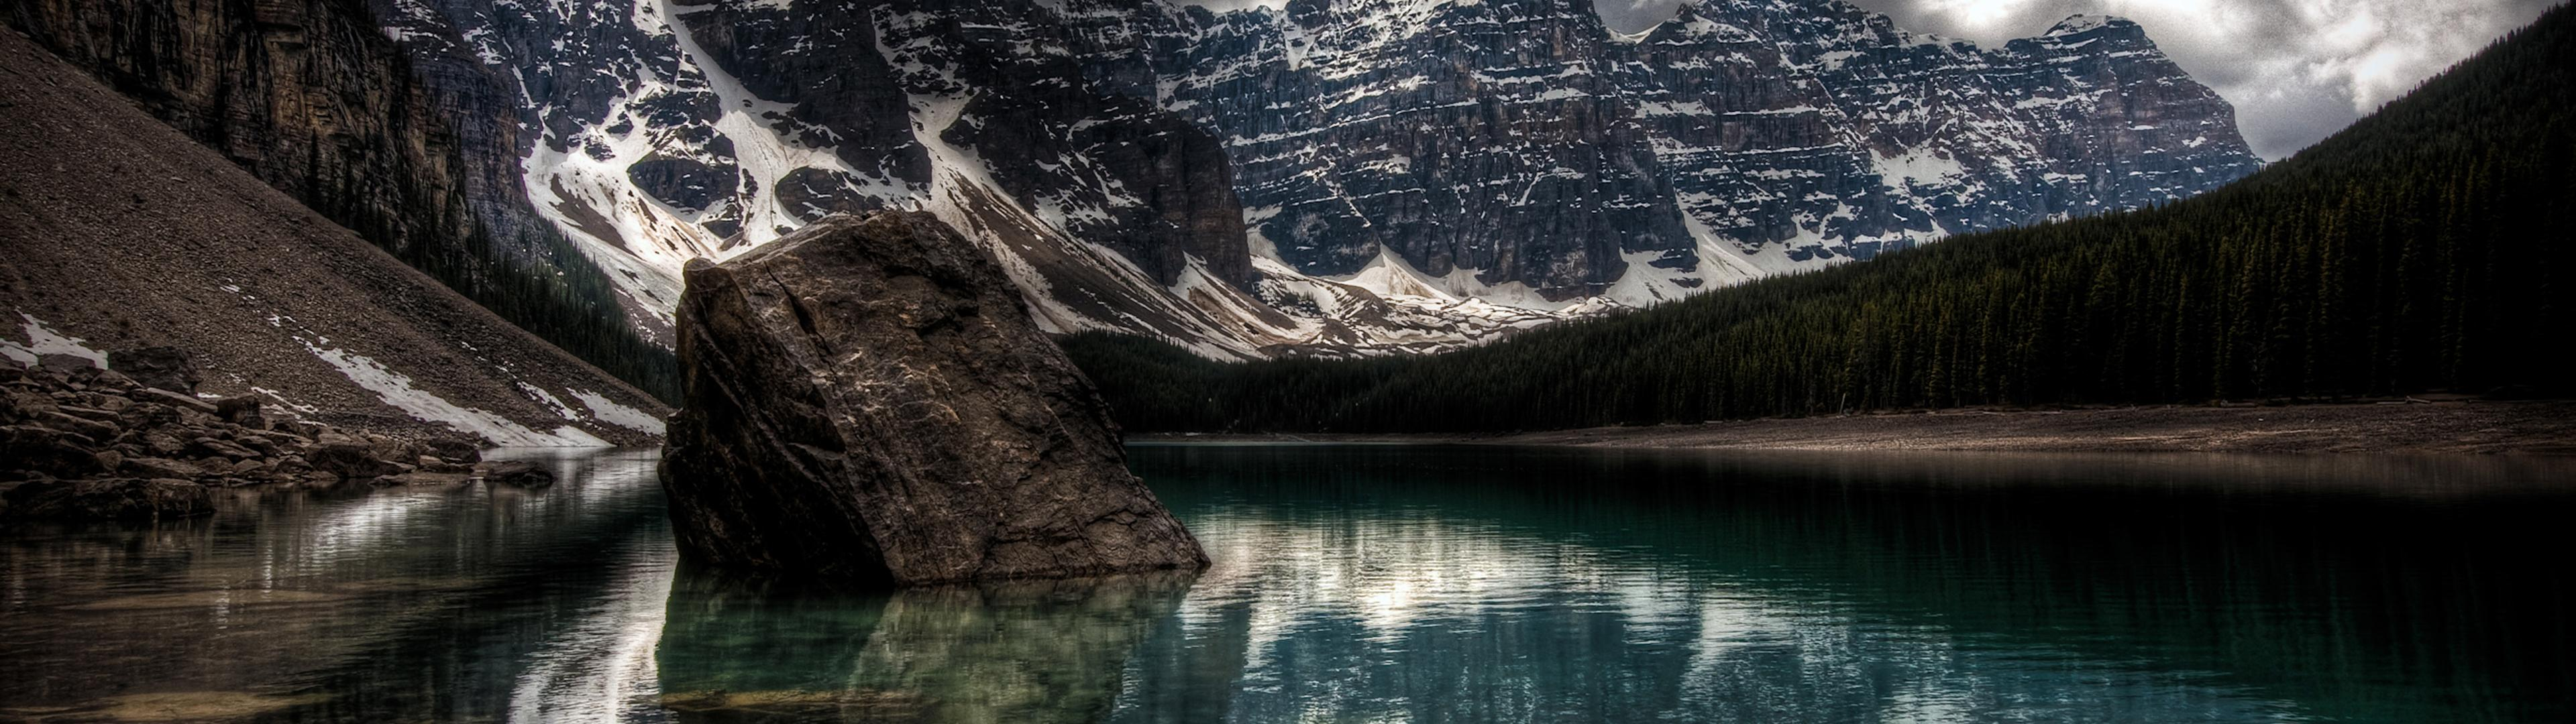 Small Lake Dual Screen Wallpapers Top Free Small Lake Dual Screen Backgrounds Wallpaperaccess